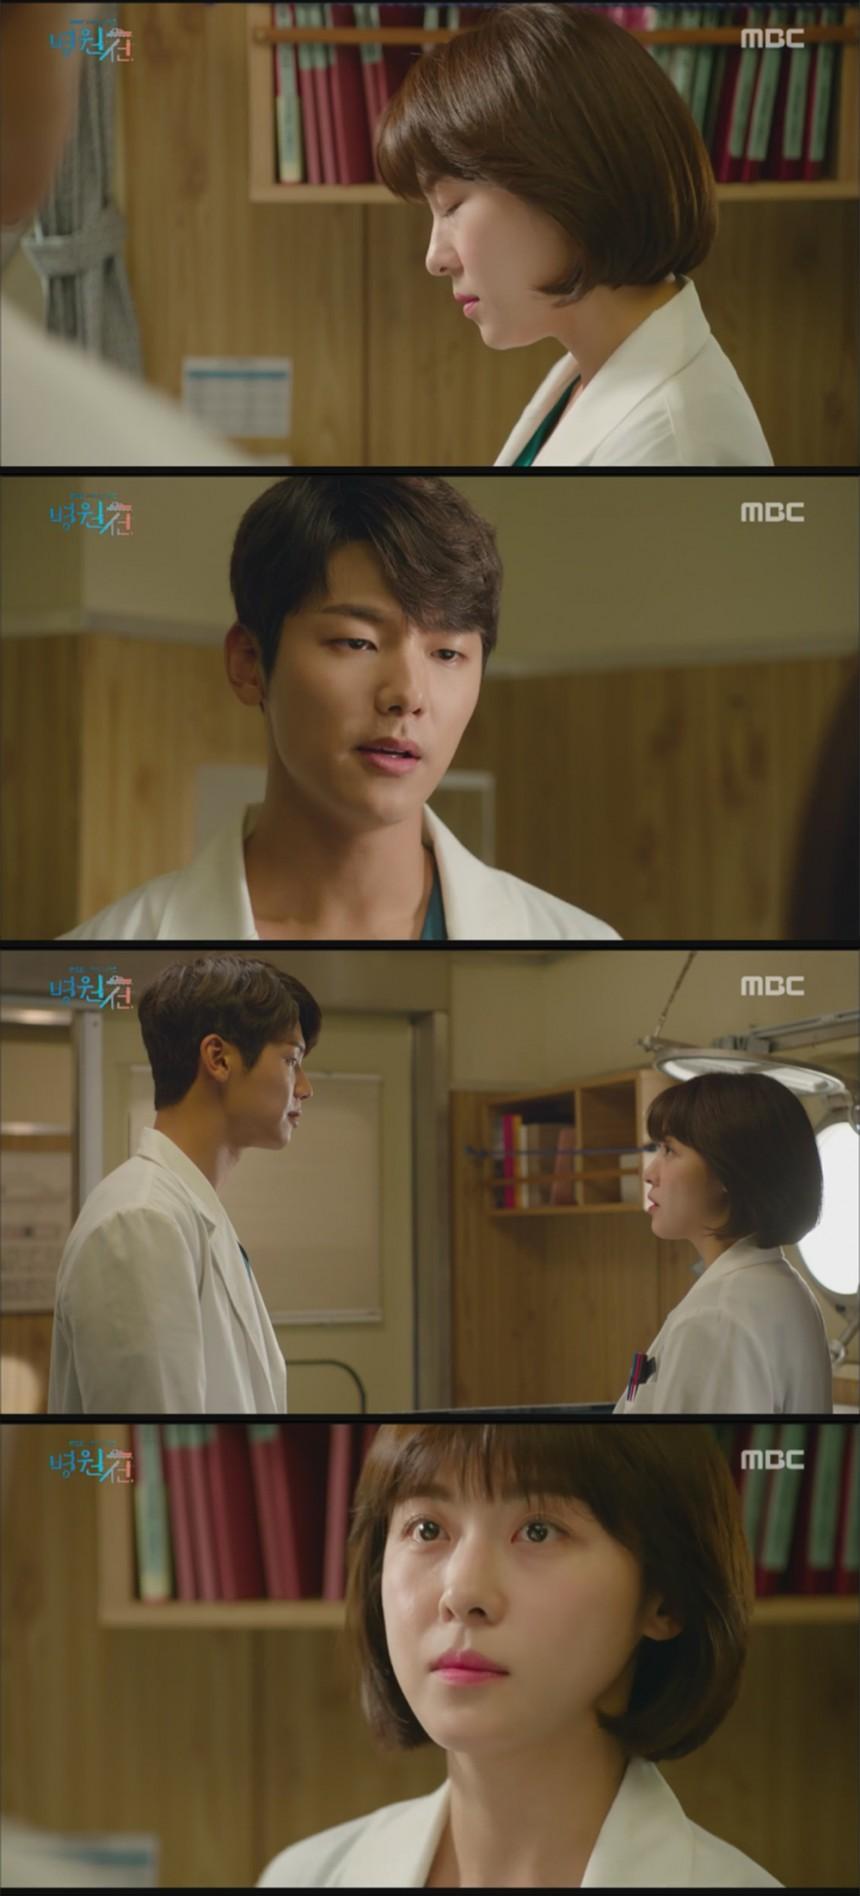 MBC '병원선' / MBC '병원선' 방송 캡처